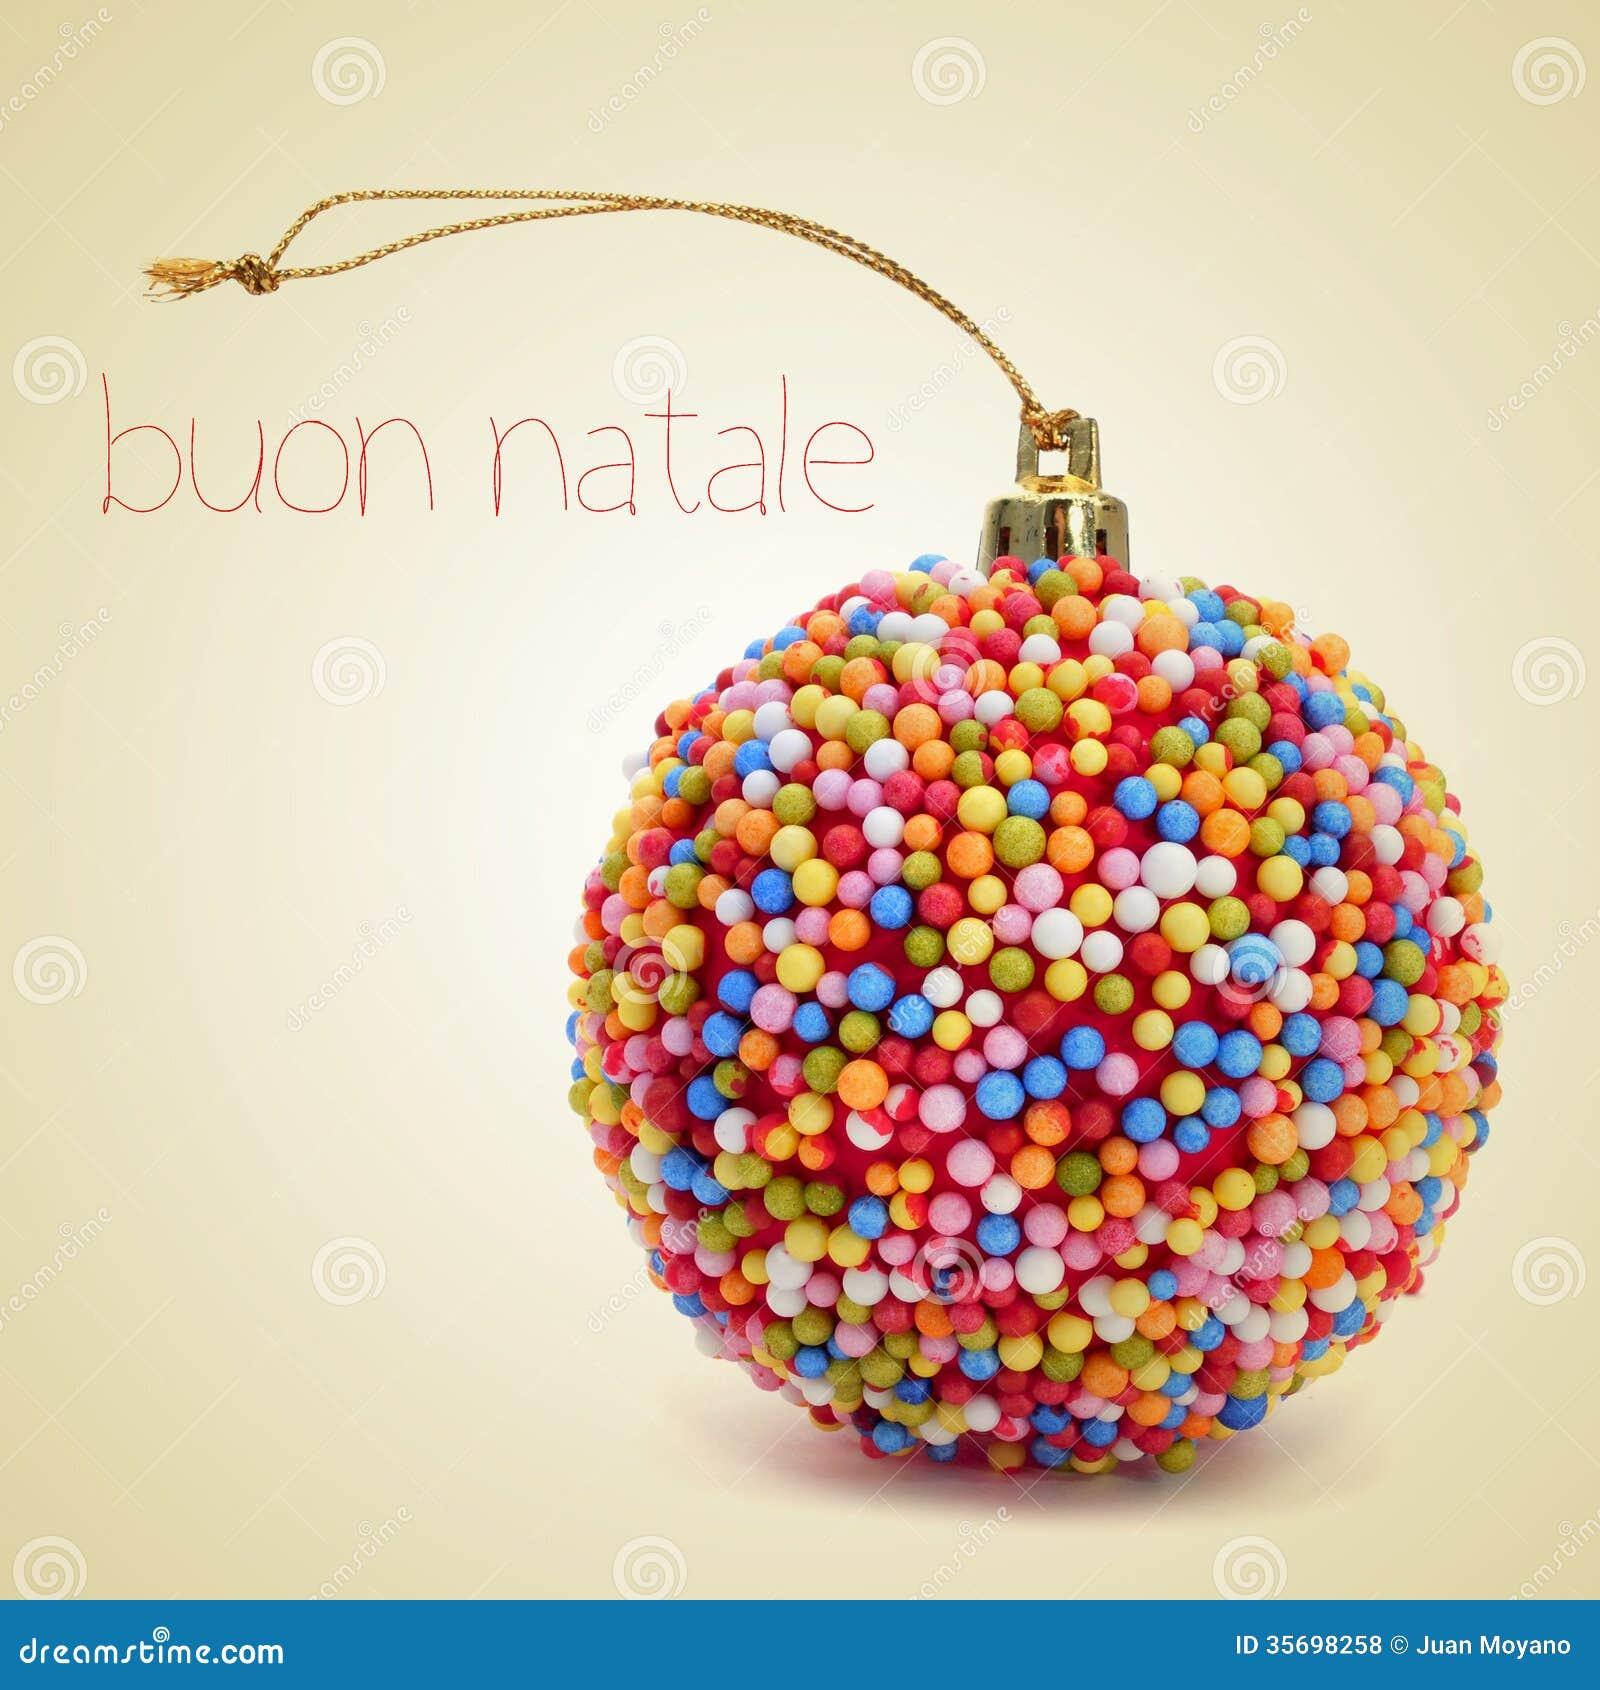 buon natale merry christmas in italian